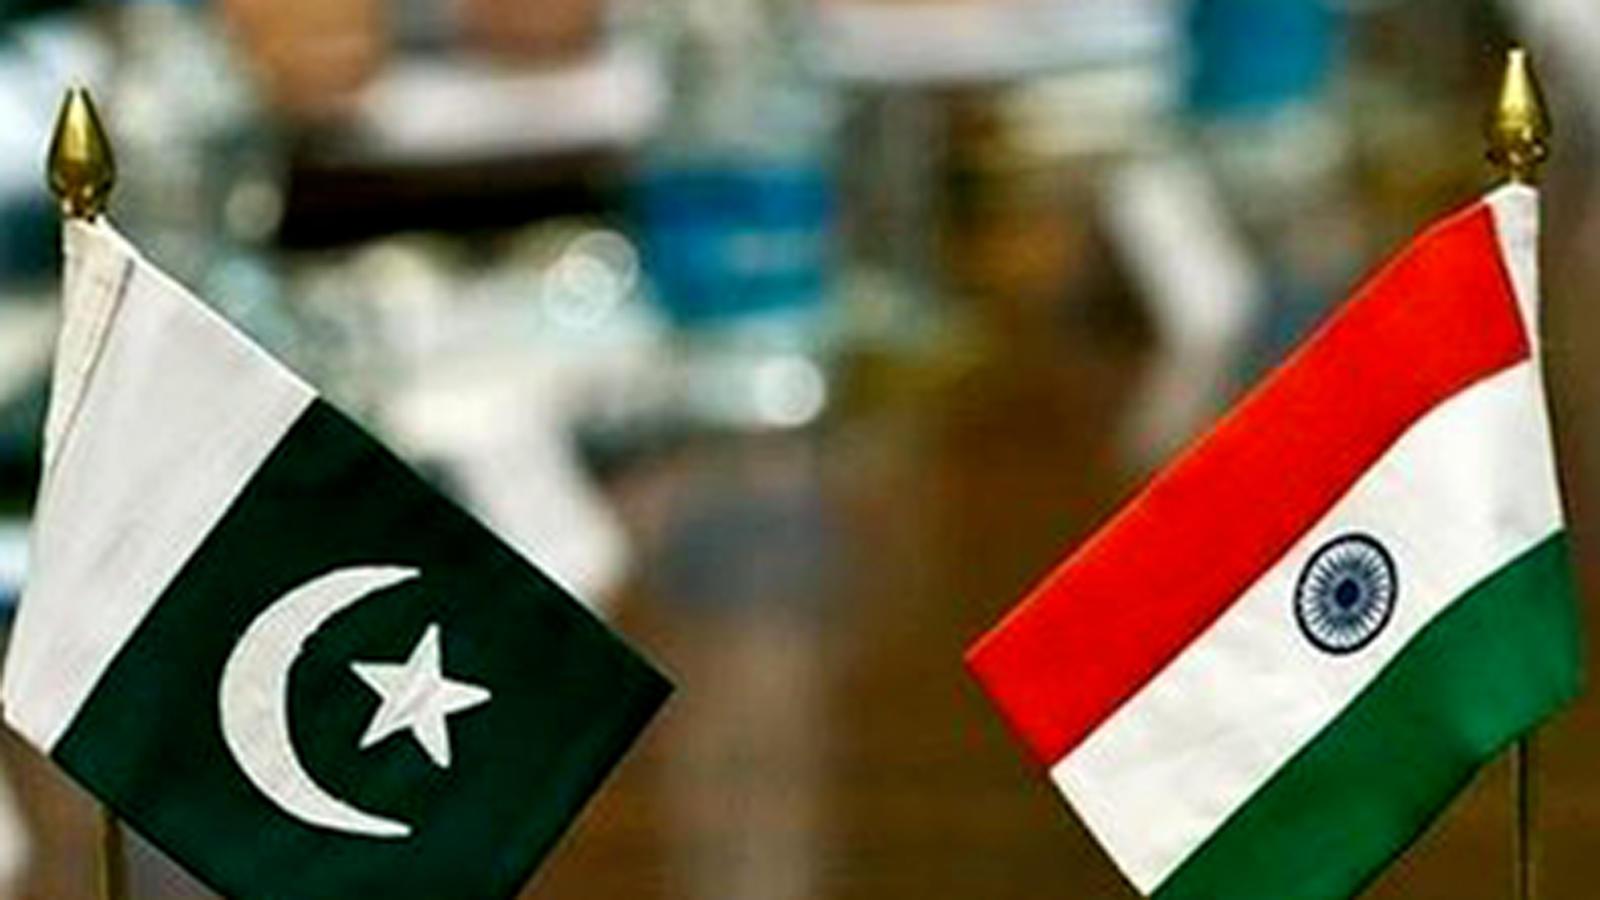 Pakistan expels Indian envoy, suspends all bilateral trade